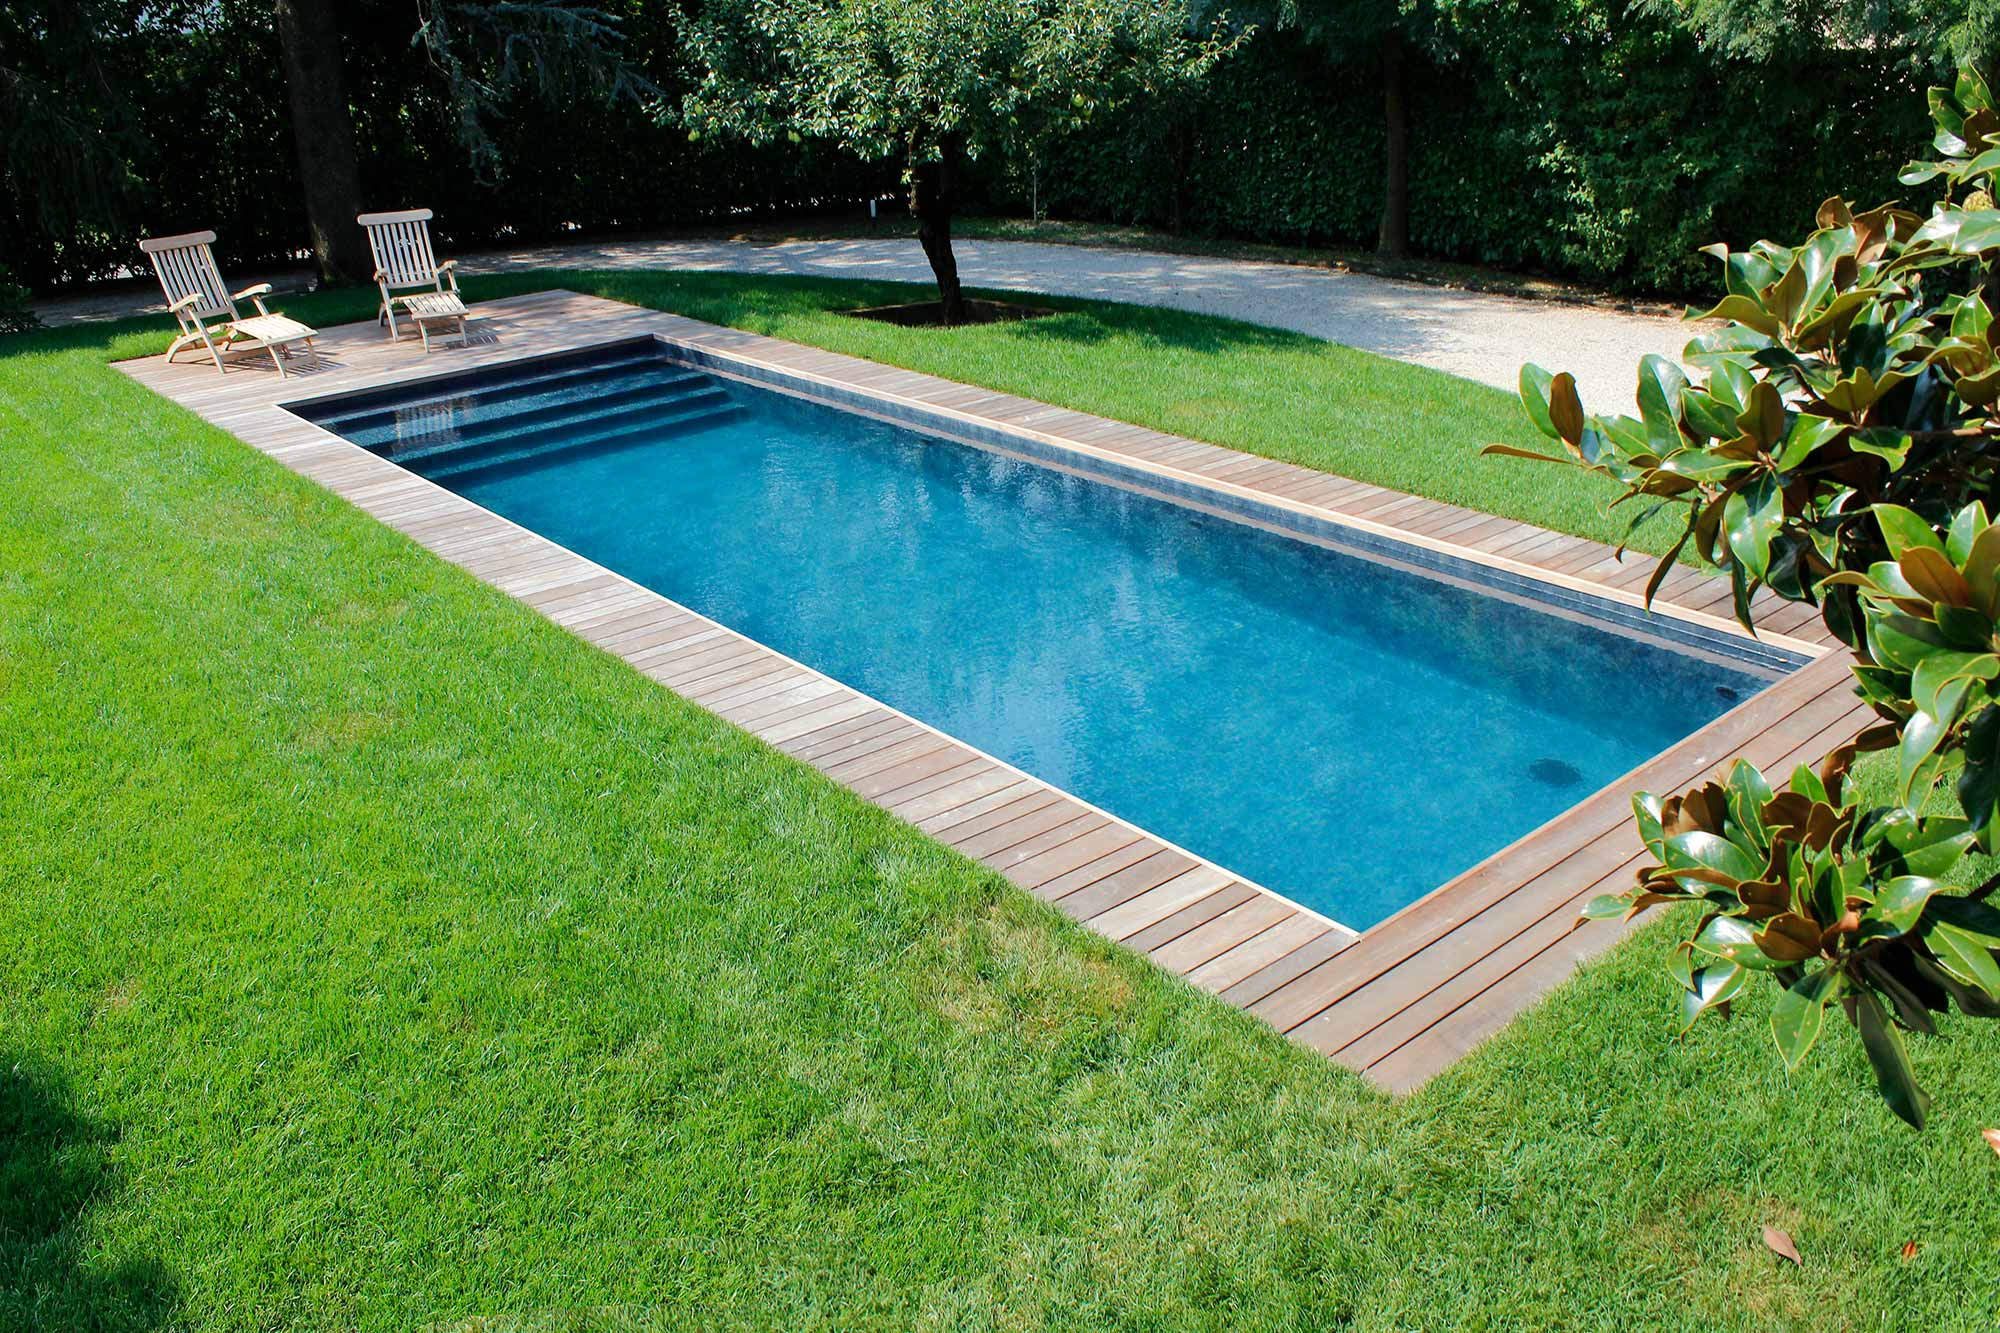 Acqua Azzurra Piscine piscine interrate da giardino | piscine, da terrazzo e